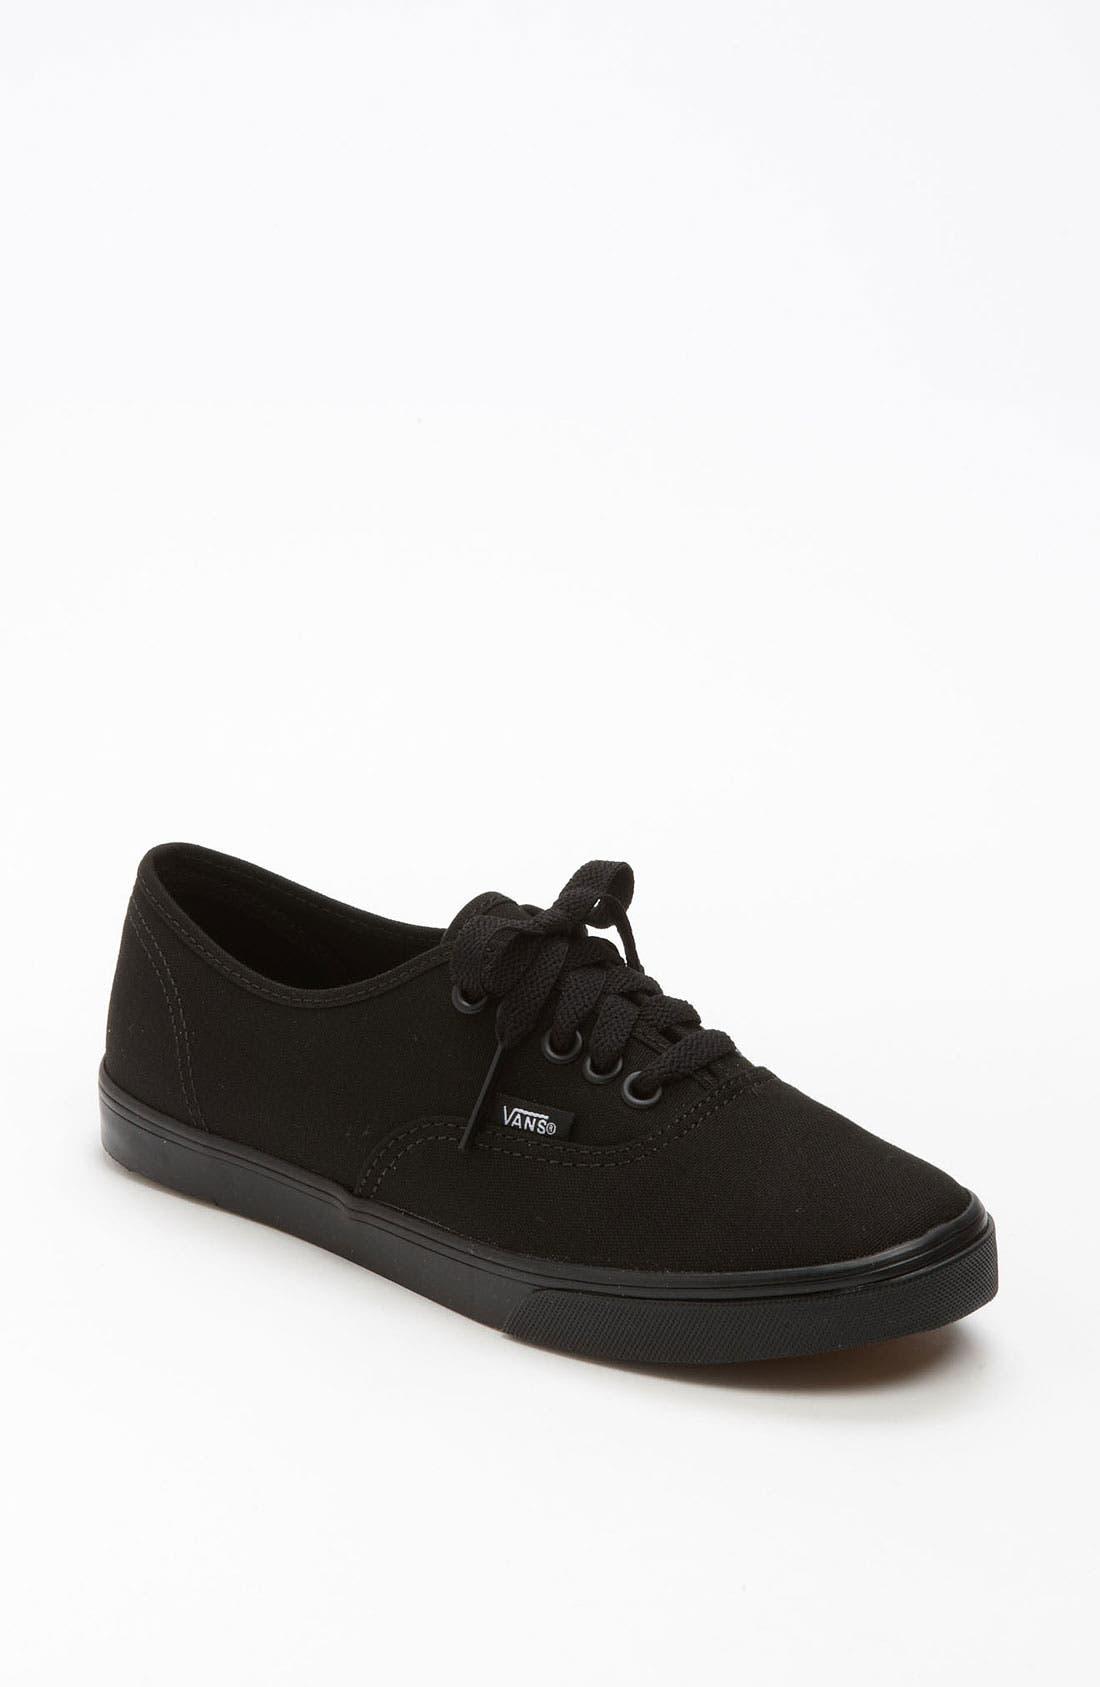 Main Image - Vans 'Authentic - Lo Pro' Sneaker (Women)